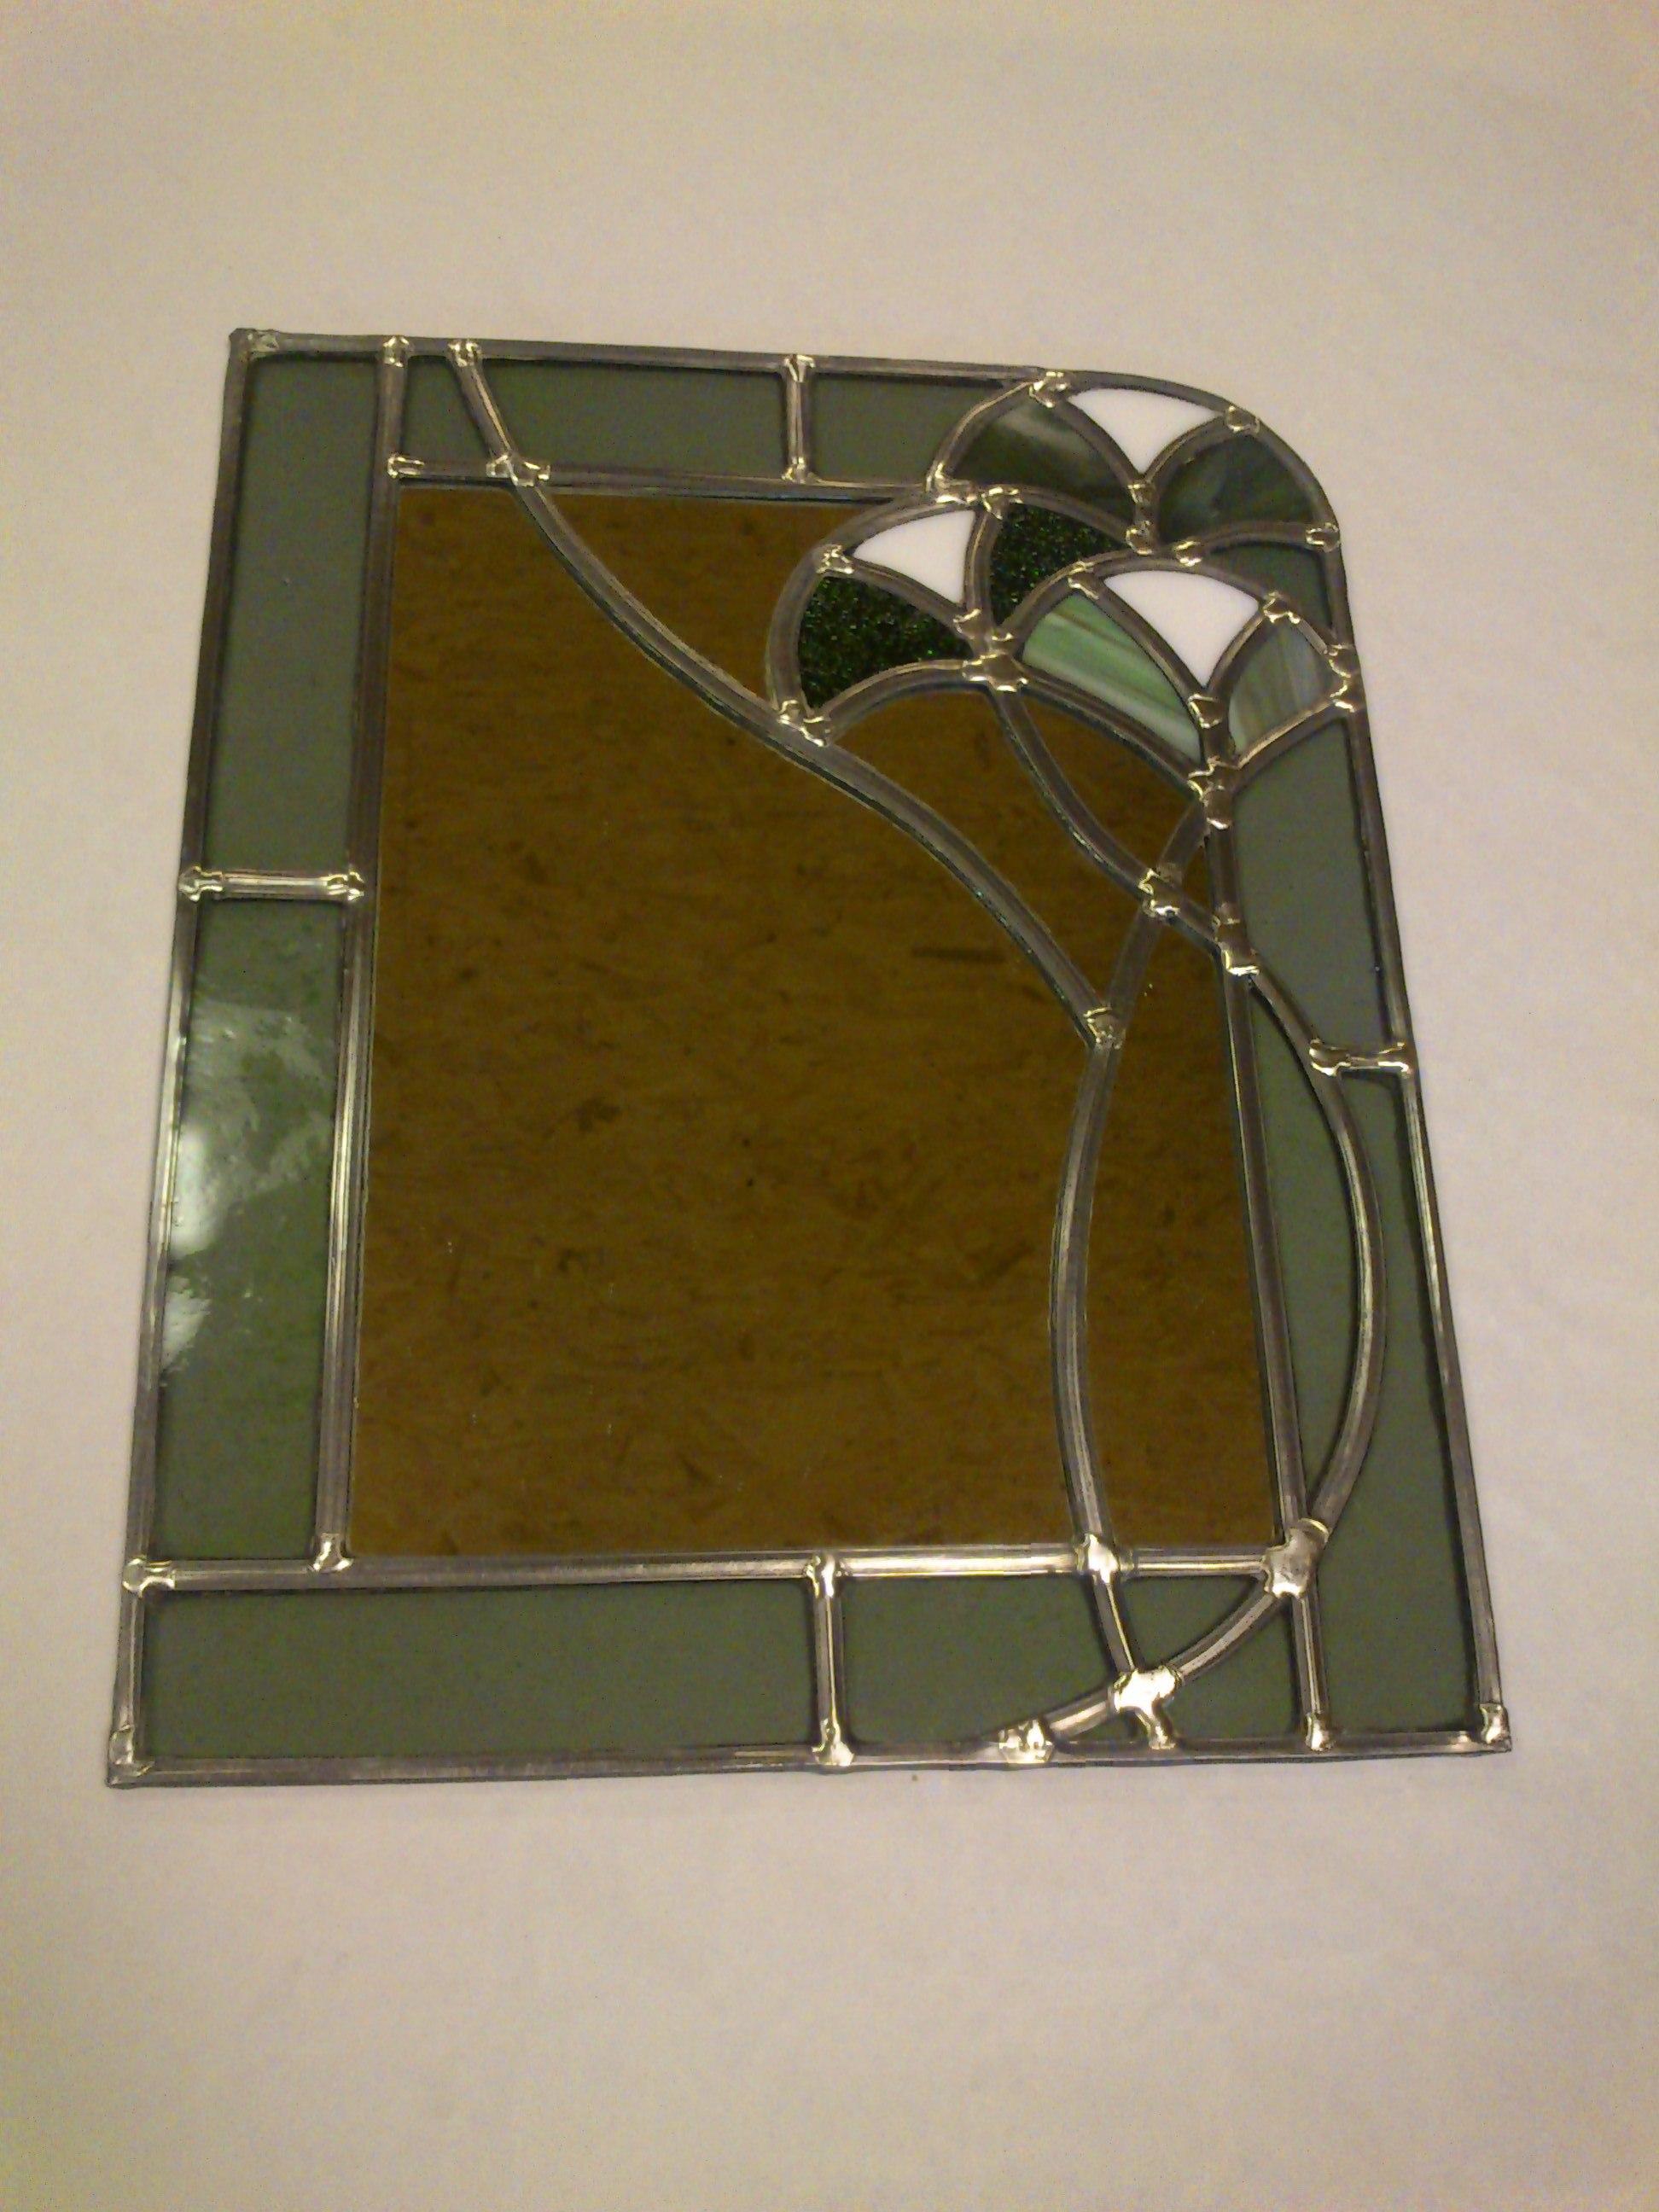 vitrail houquetot fusing miroir mini serre miroir 3d. Black Bedroom Furniture Sets. Home Design Ideas